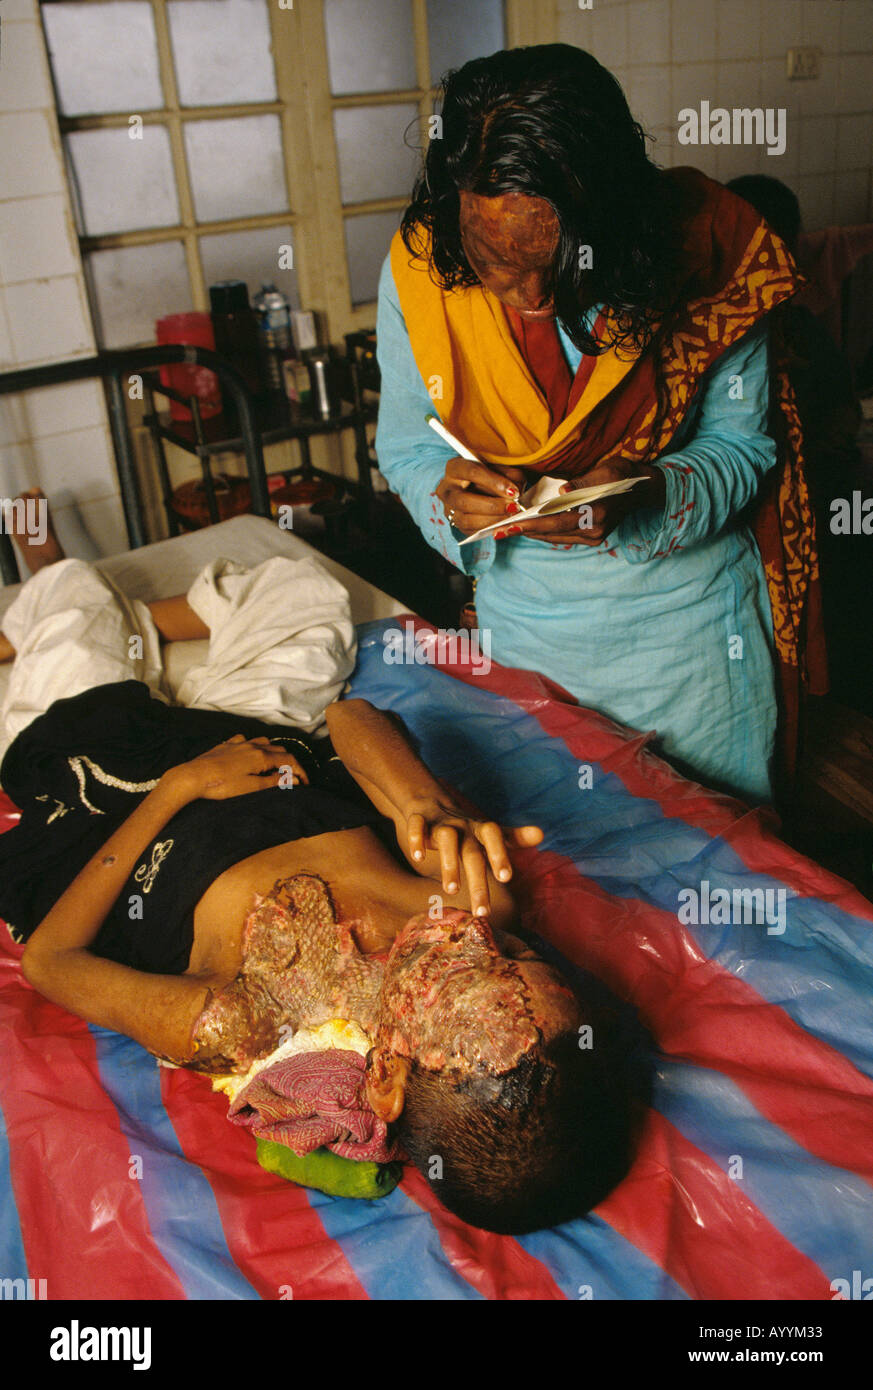 Acid attack survivor is treated in the burns unit of Dhaka Hospital, Bangladesh - Stock Image